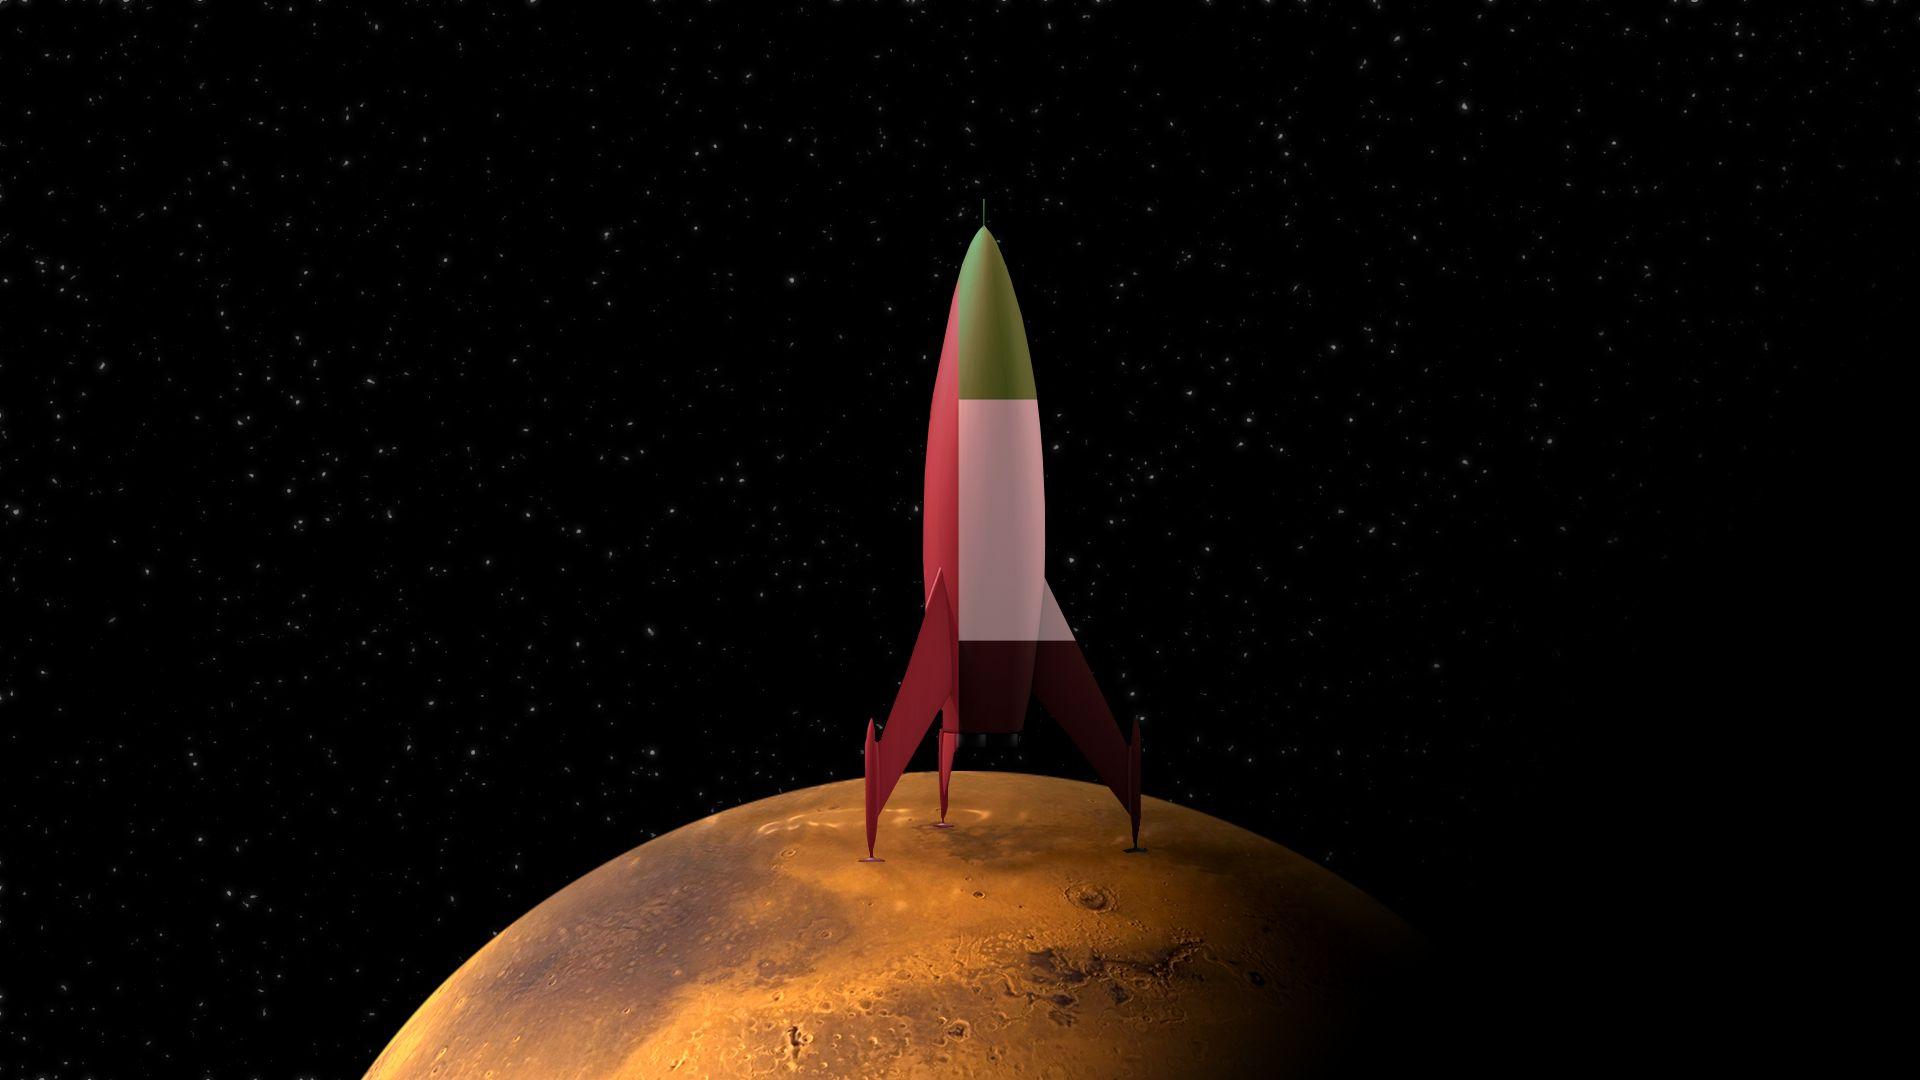 Illustration of rocket on Mars with United Arab Emirate colors